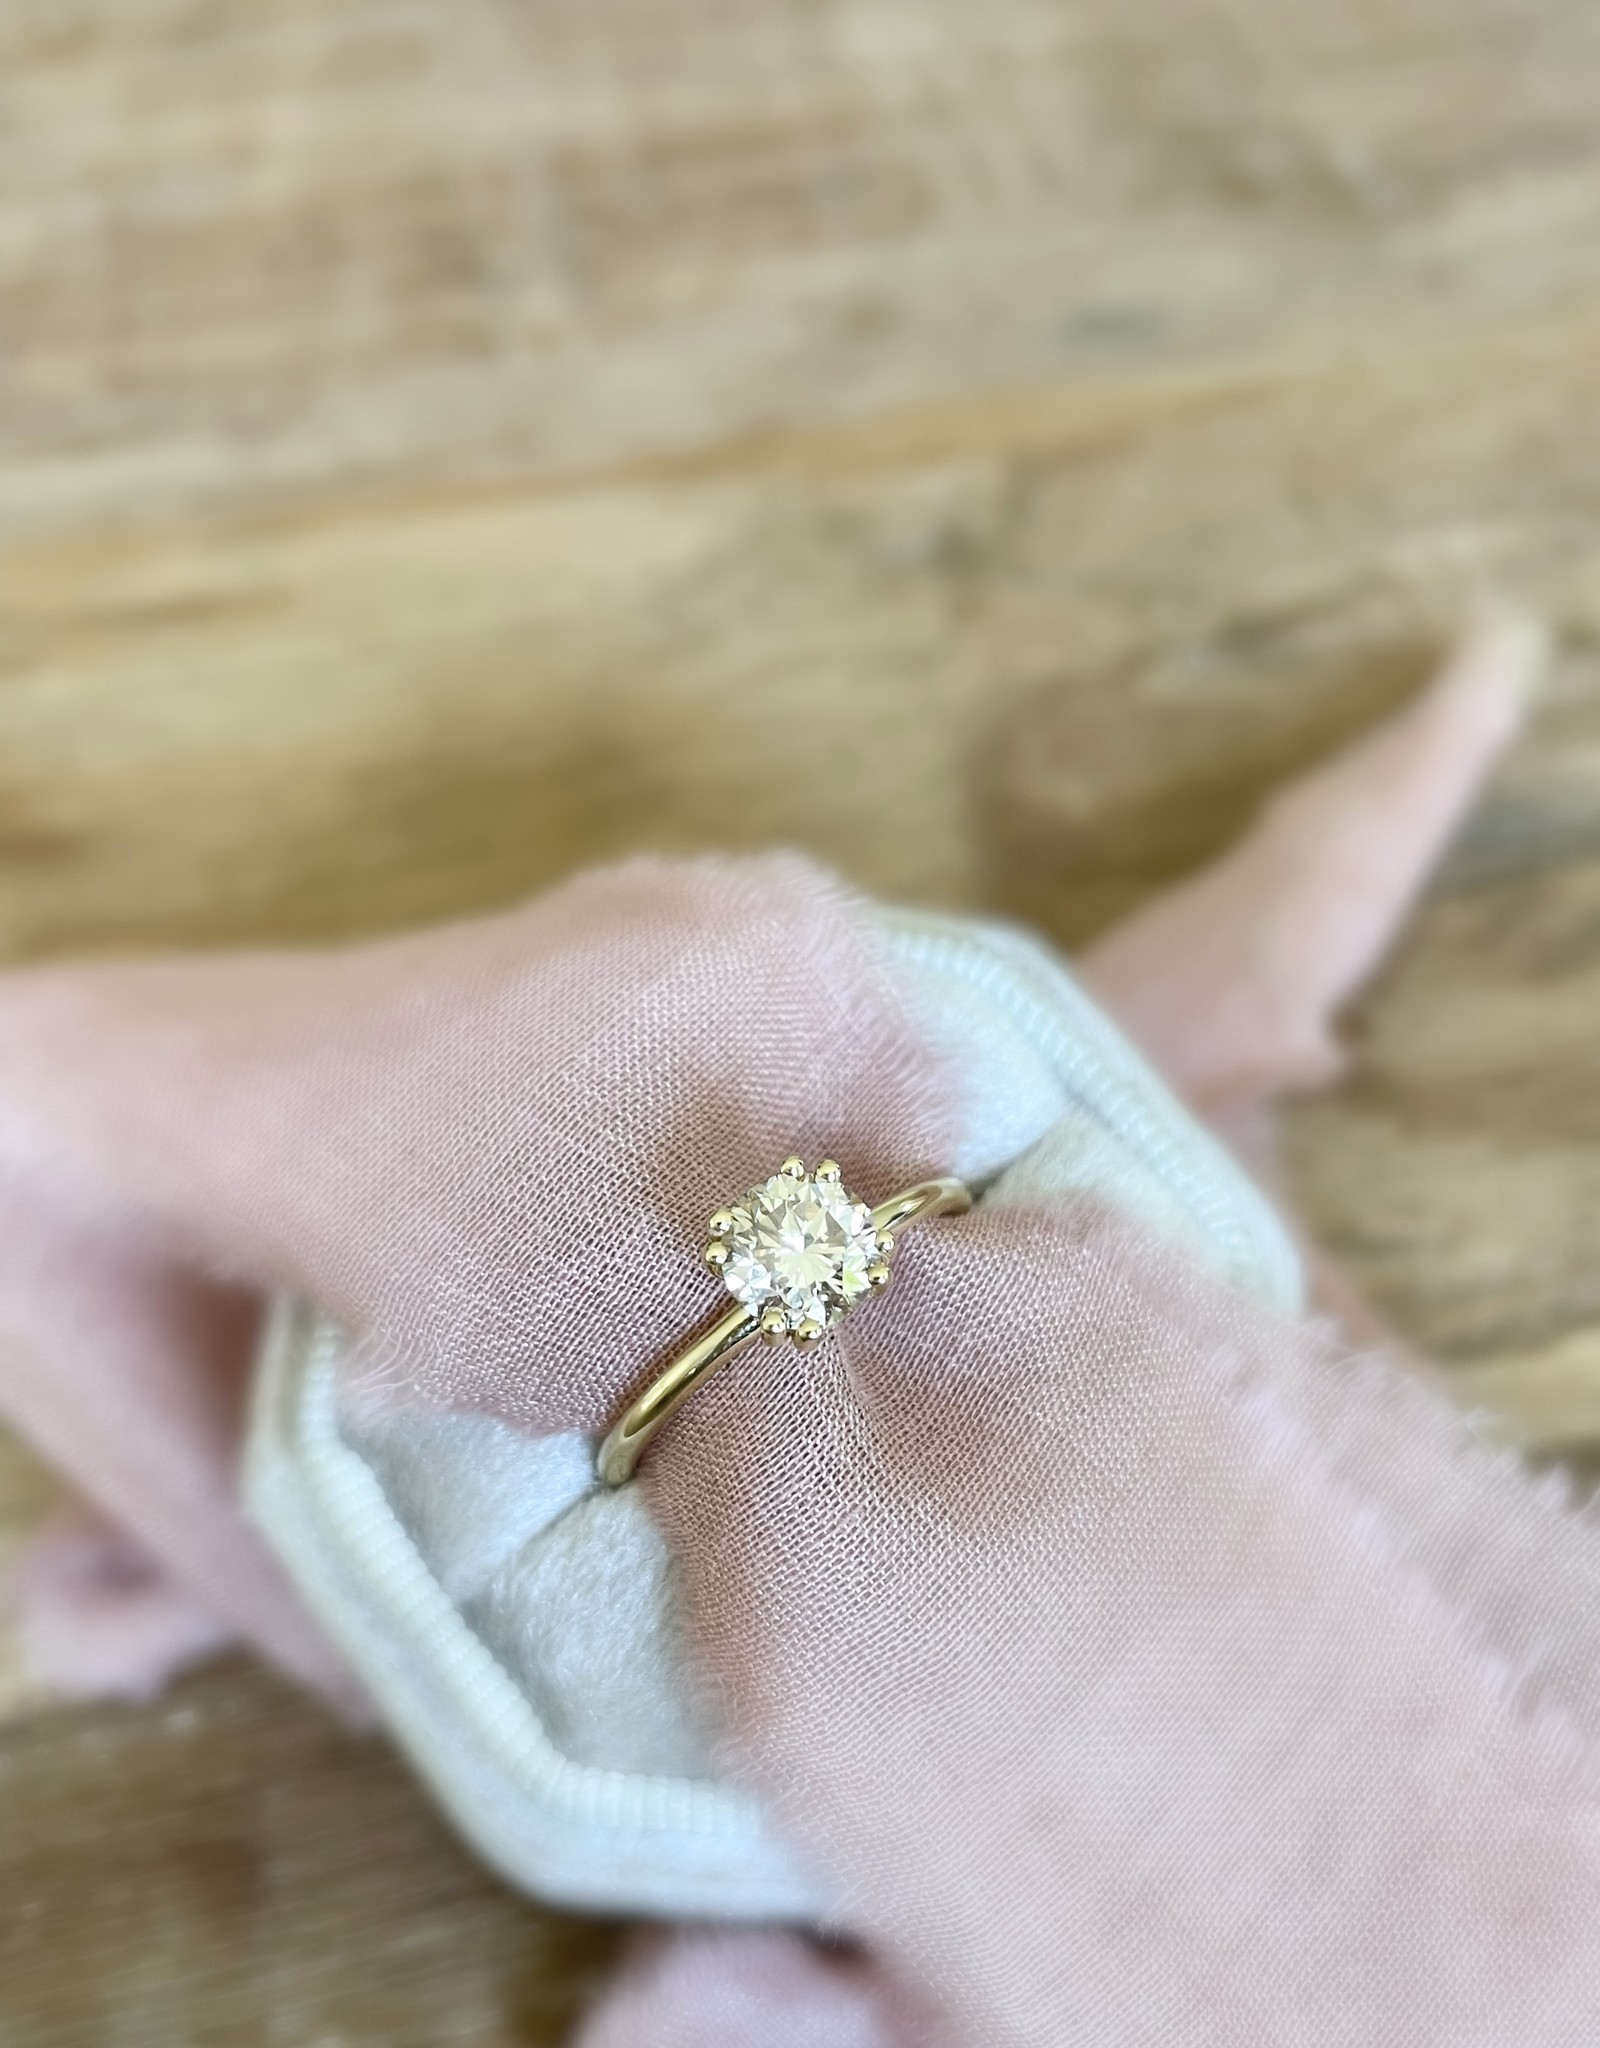 Atelier Maison Maat 54 - No.67 - The Big Sunset Lover - 18 karaat geel goud - Champagne Diamant